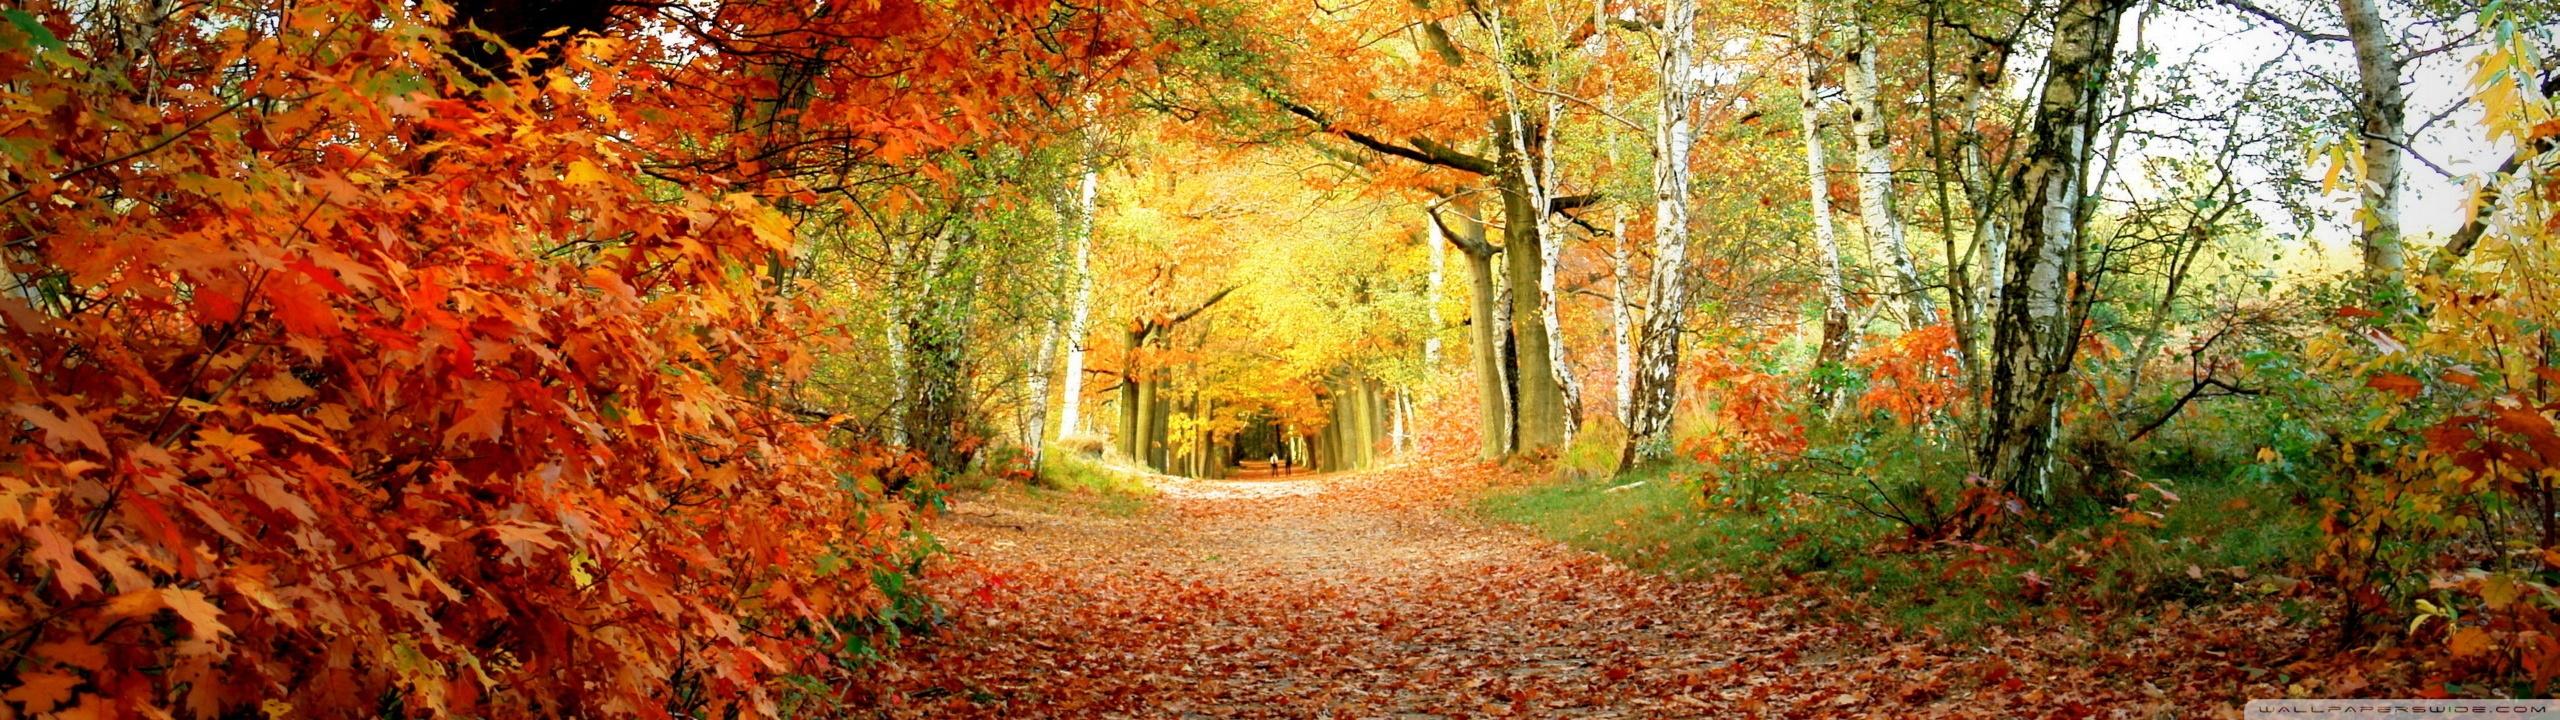 Foliage Wallpaper 35458 1920x1080 px